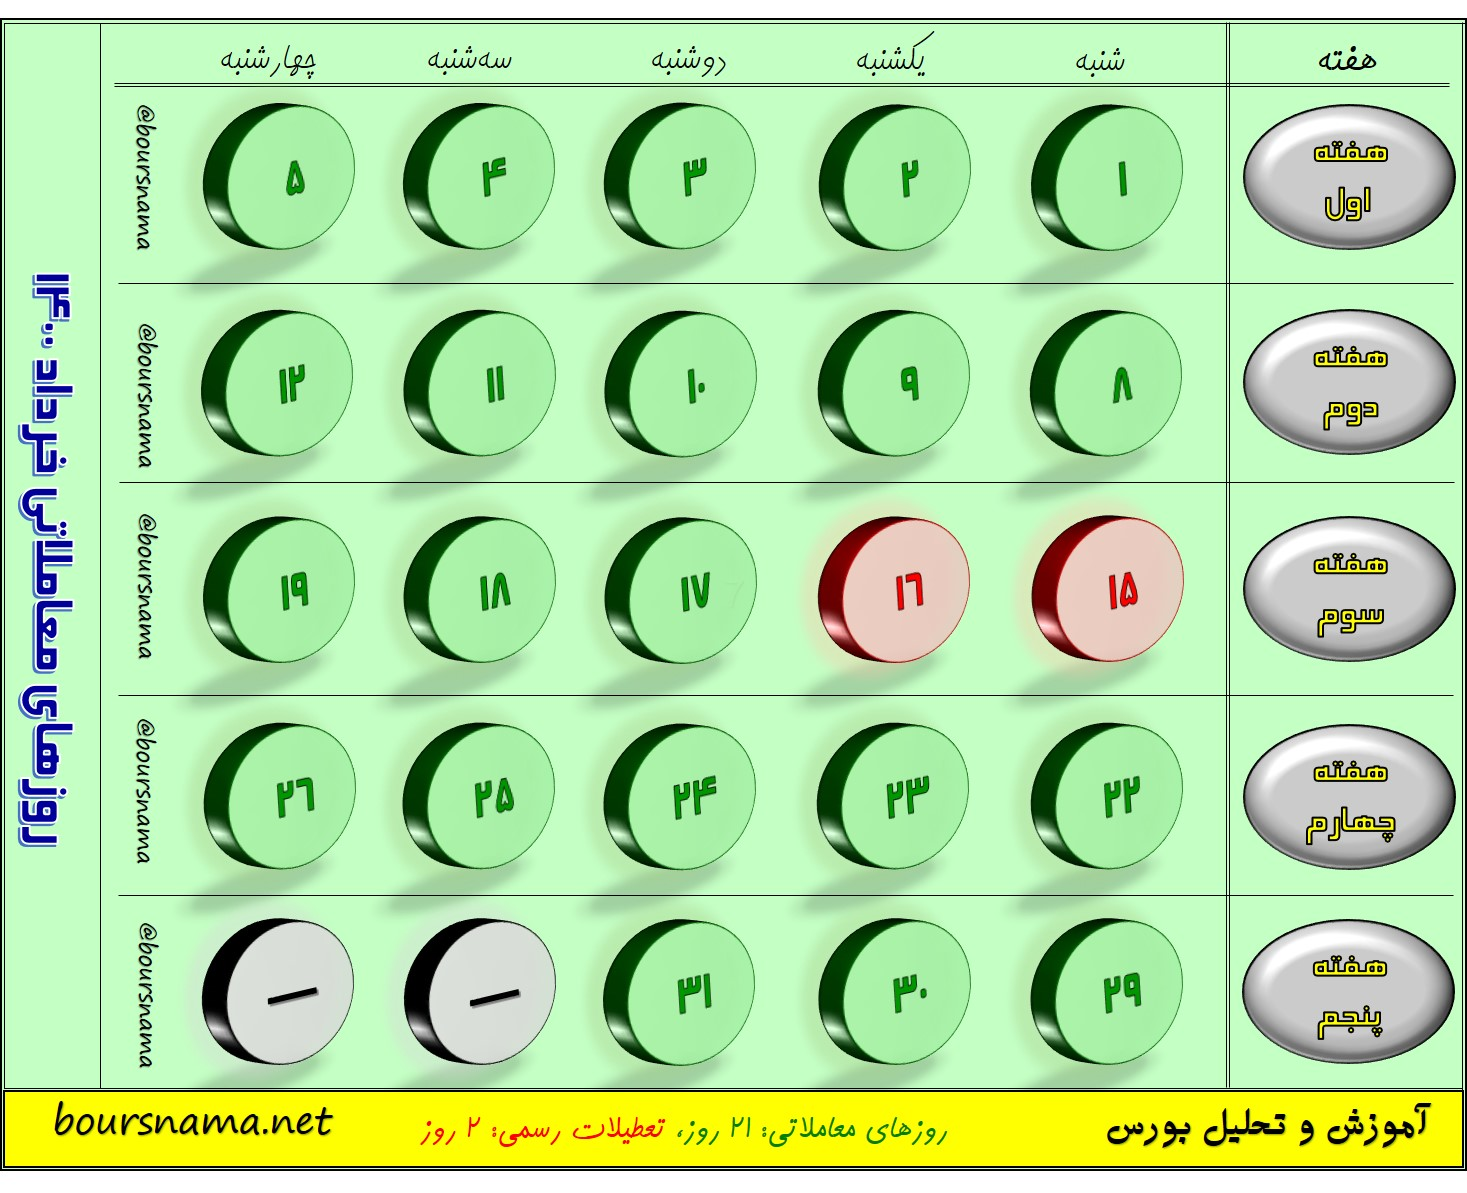 تقویم معاملاتی بورس خرداد